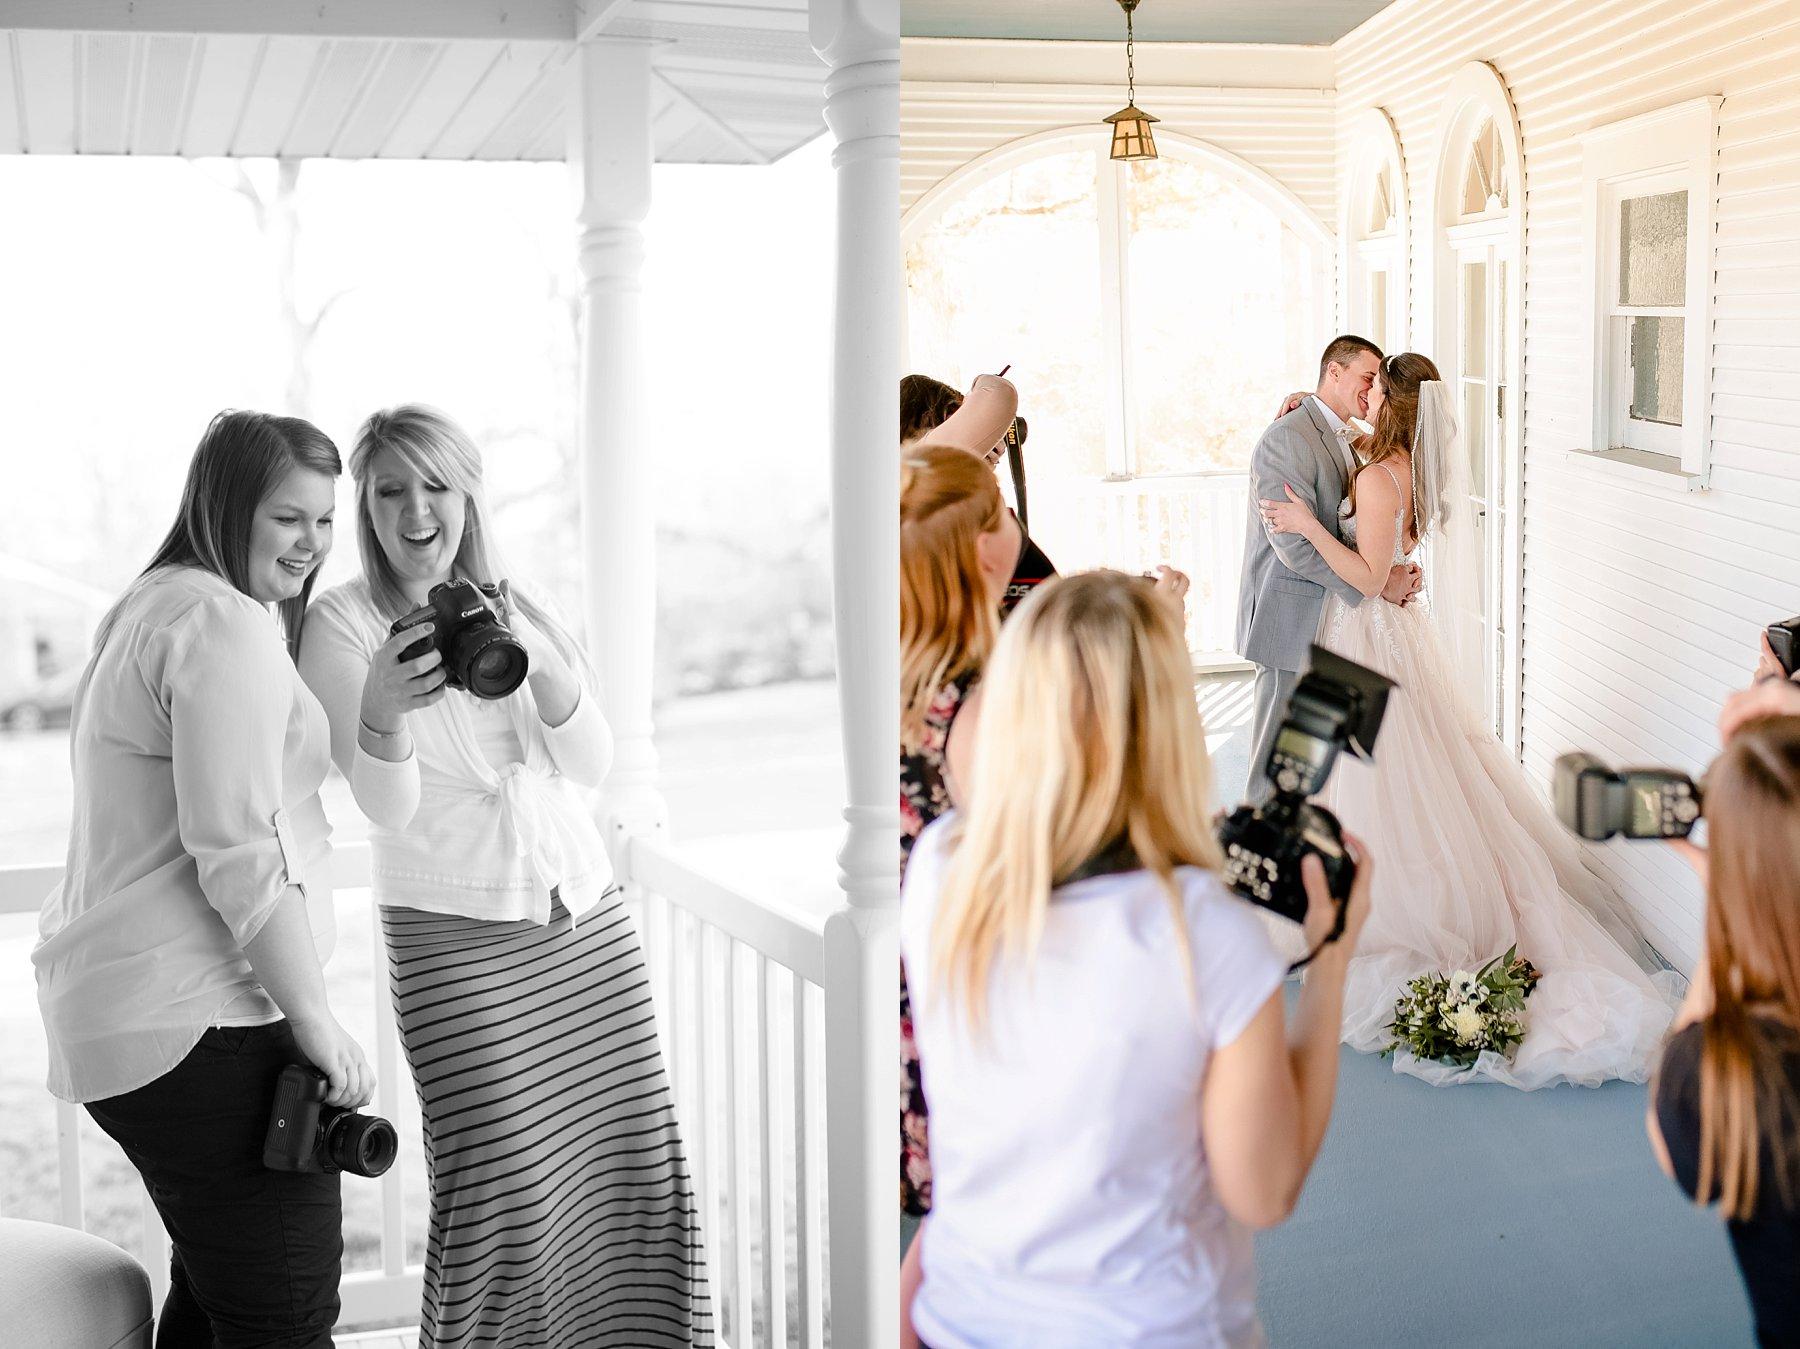 photographer_wedding_saint_louis_Kansas_City_Photography_Videography_workshop_training_styled_engagement_Lake_Ozark_KC_MO_STL_Rolla_Hermann_Saint_James_0432.jpg